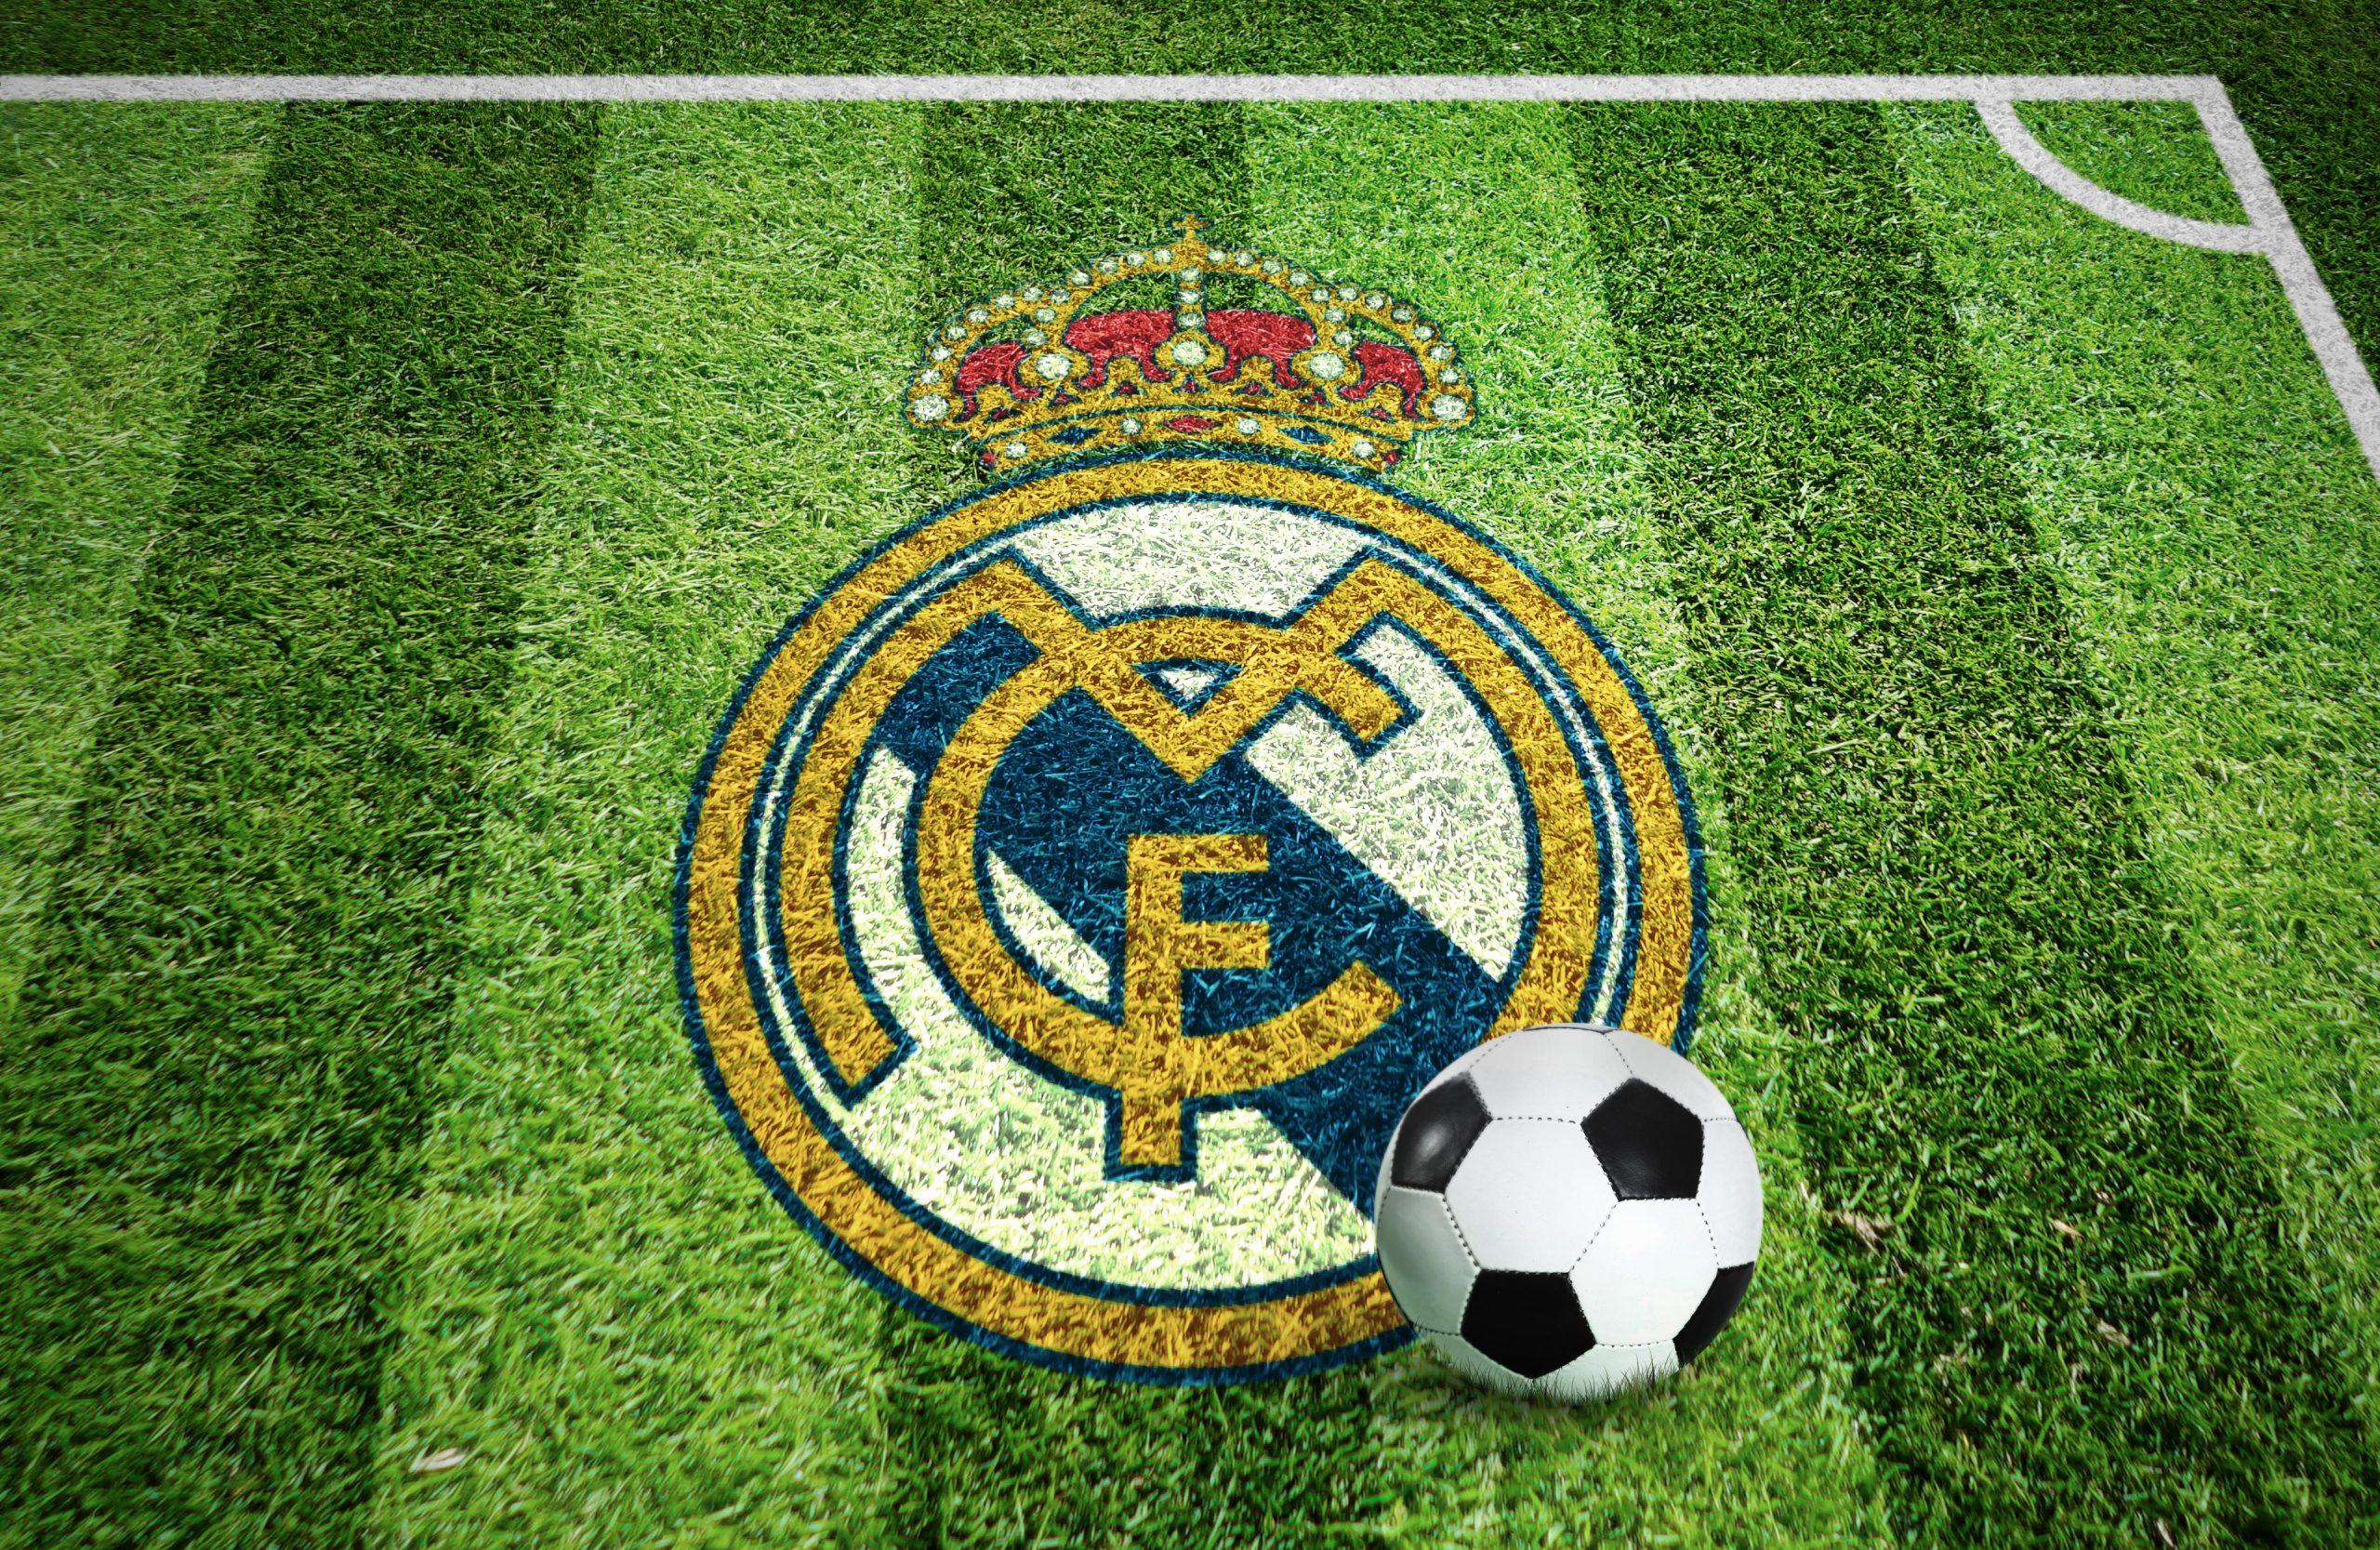 Real Madrid Stadium Grass Ground Logo Mockup